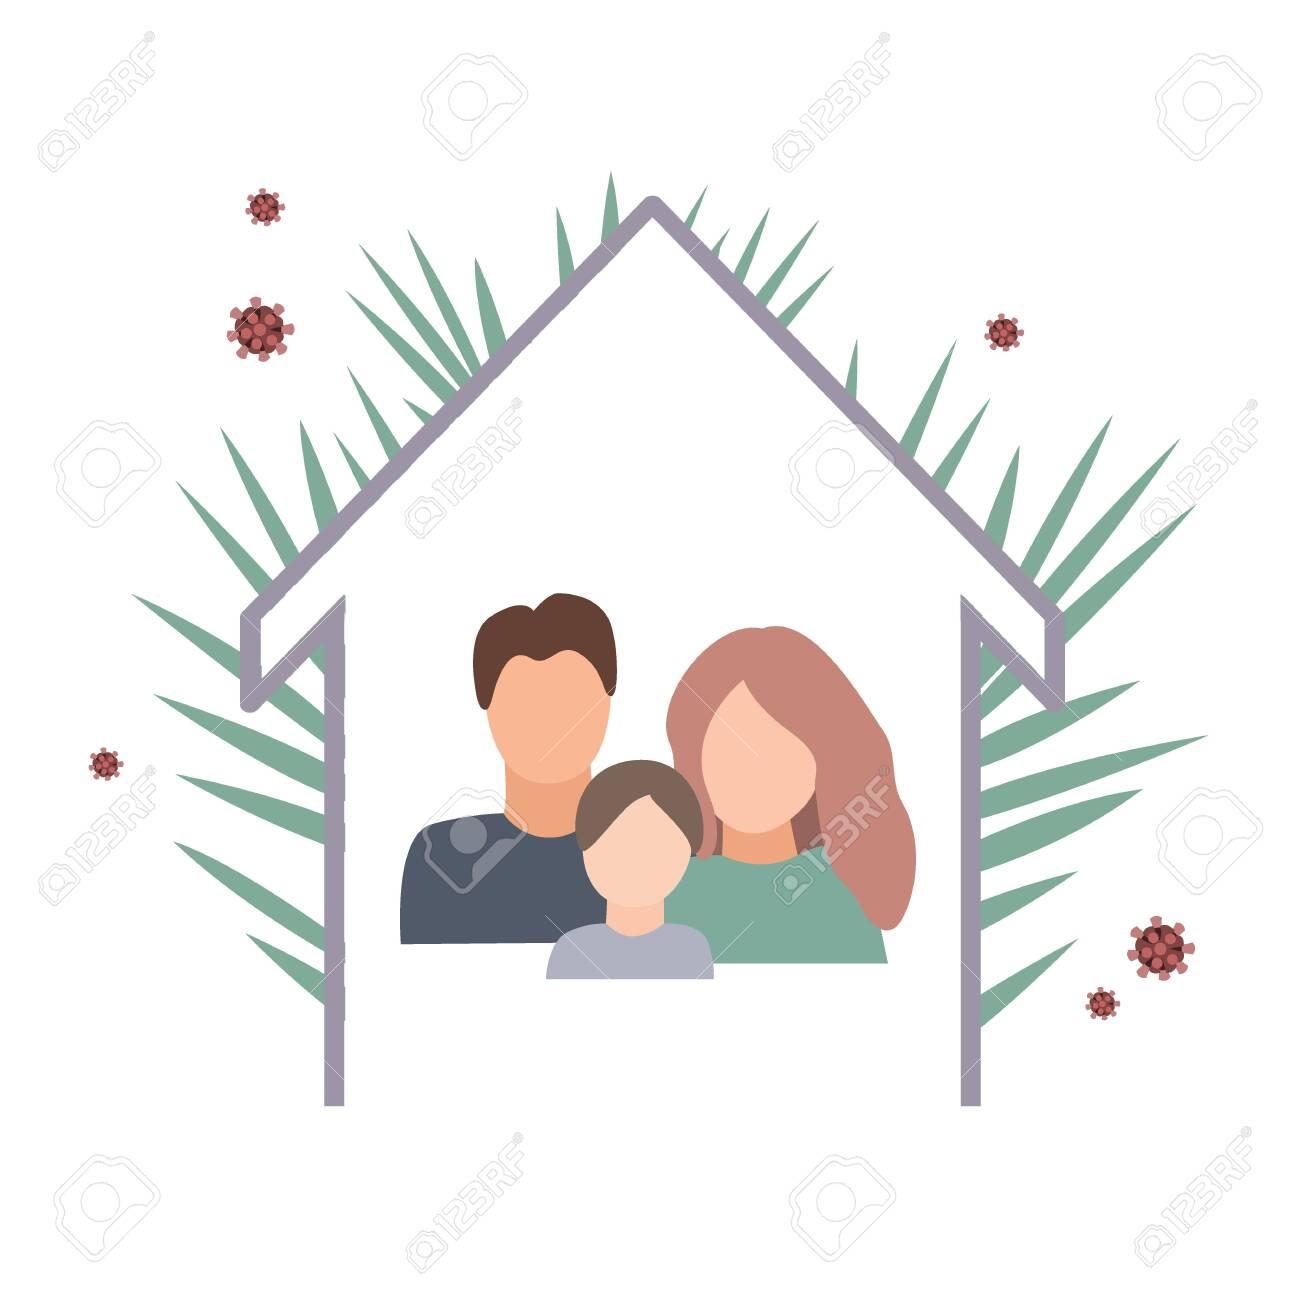 Coronavirus quarantine concept with family staying at home. Flat cartoon vector illustration - 142894065